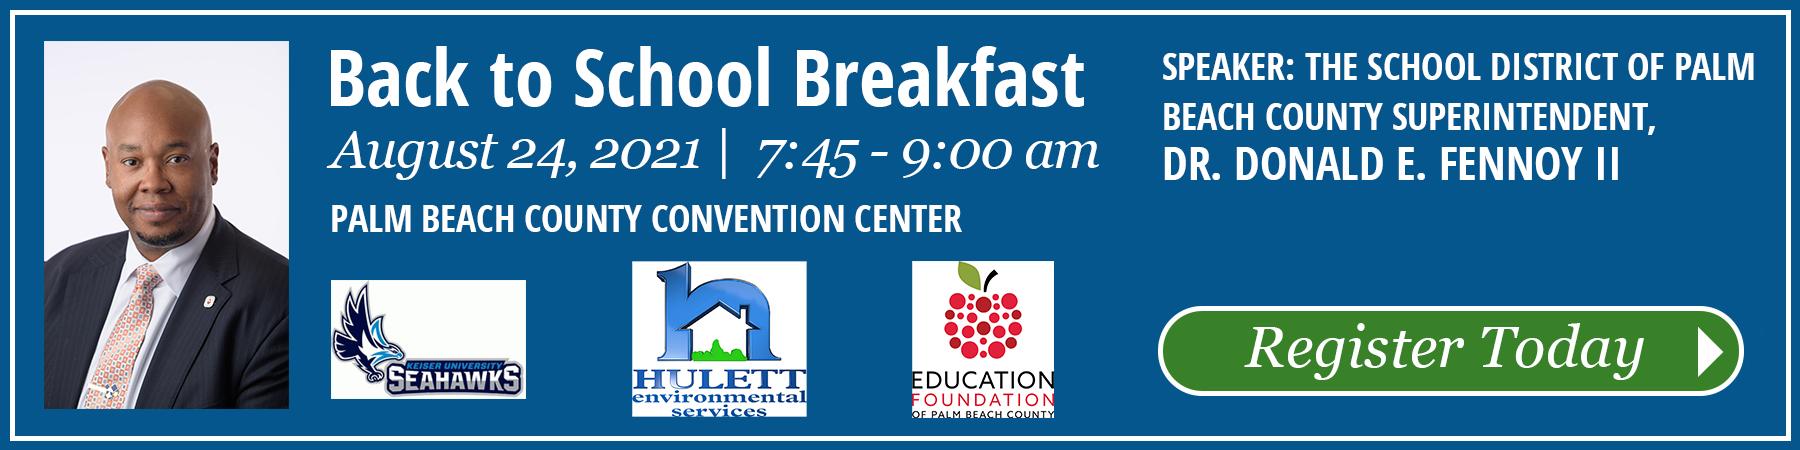 Aug_BacktoSchool_Breakfast_WebBanner_8-24-2021